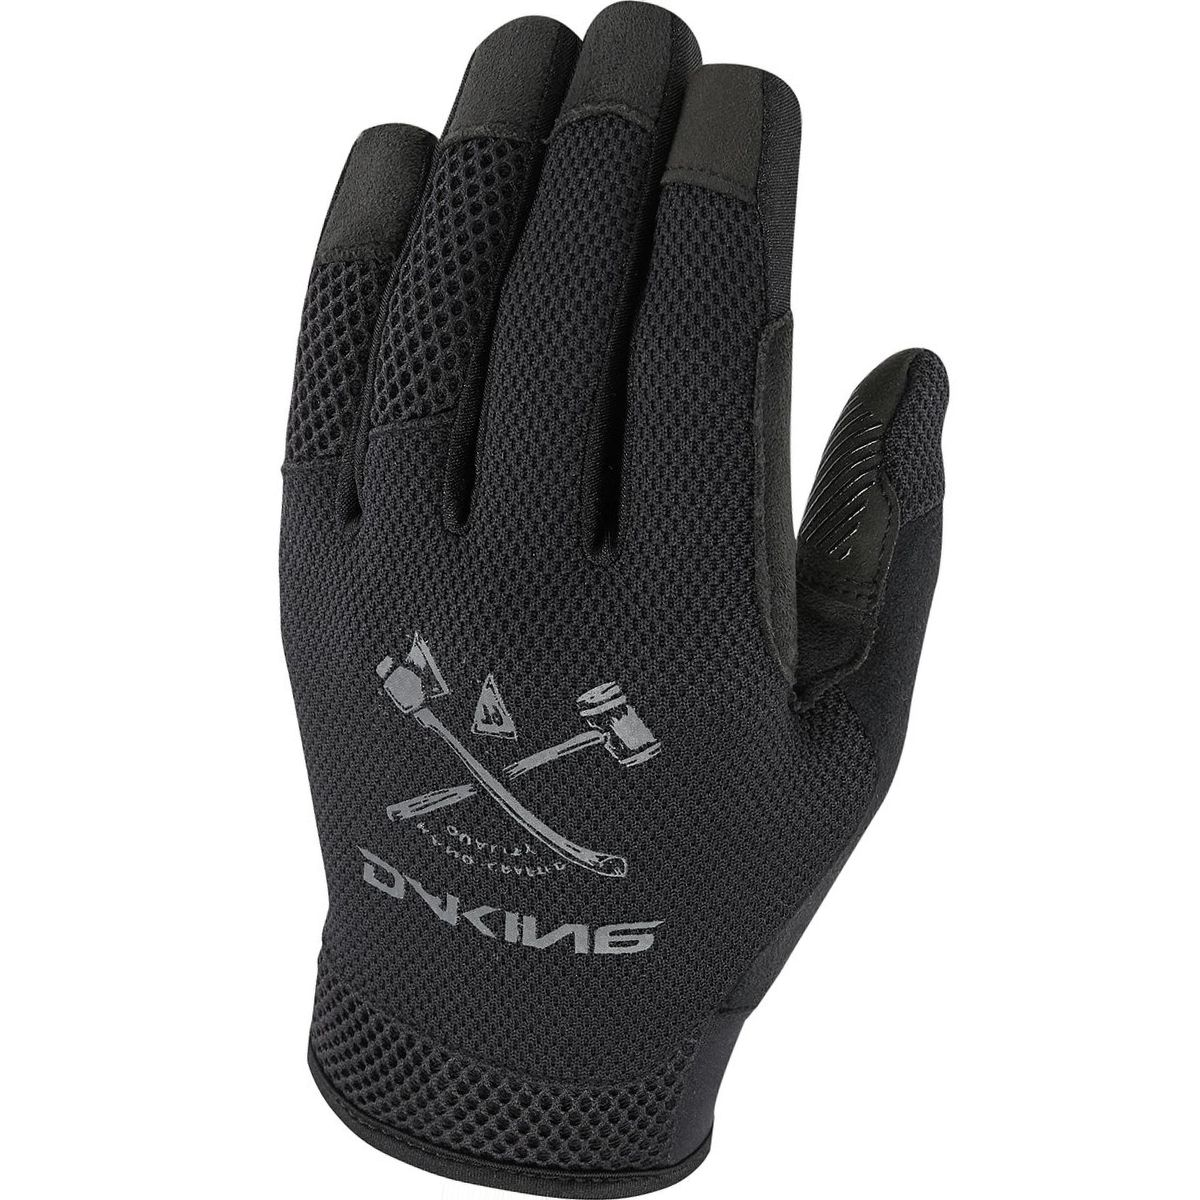 DAKINE Covert Glove - Men's